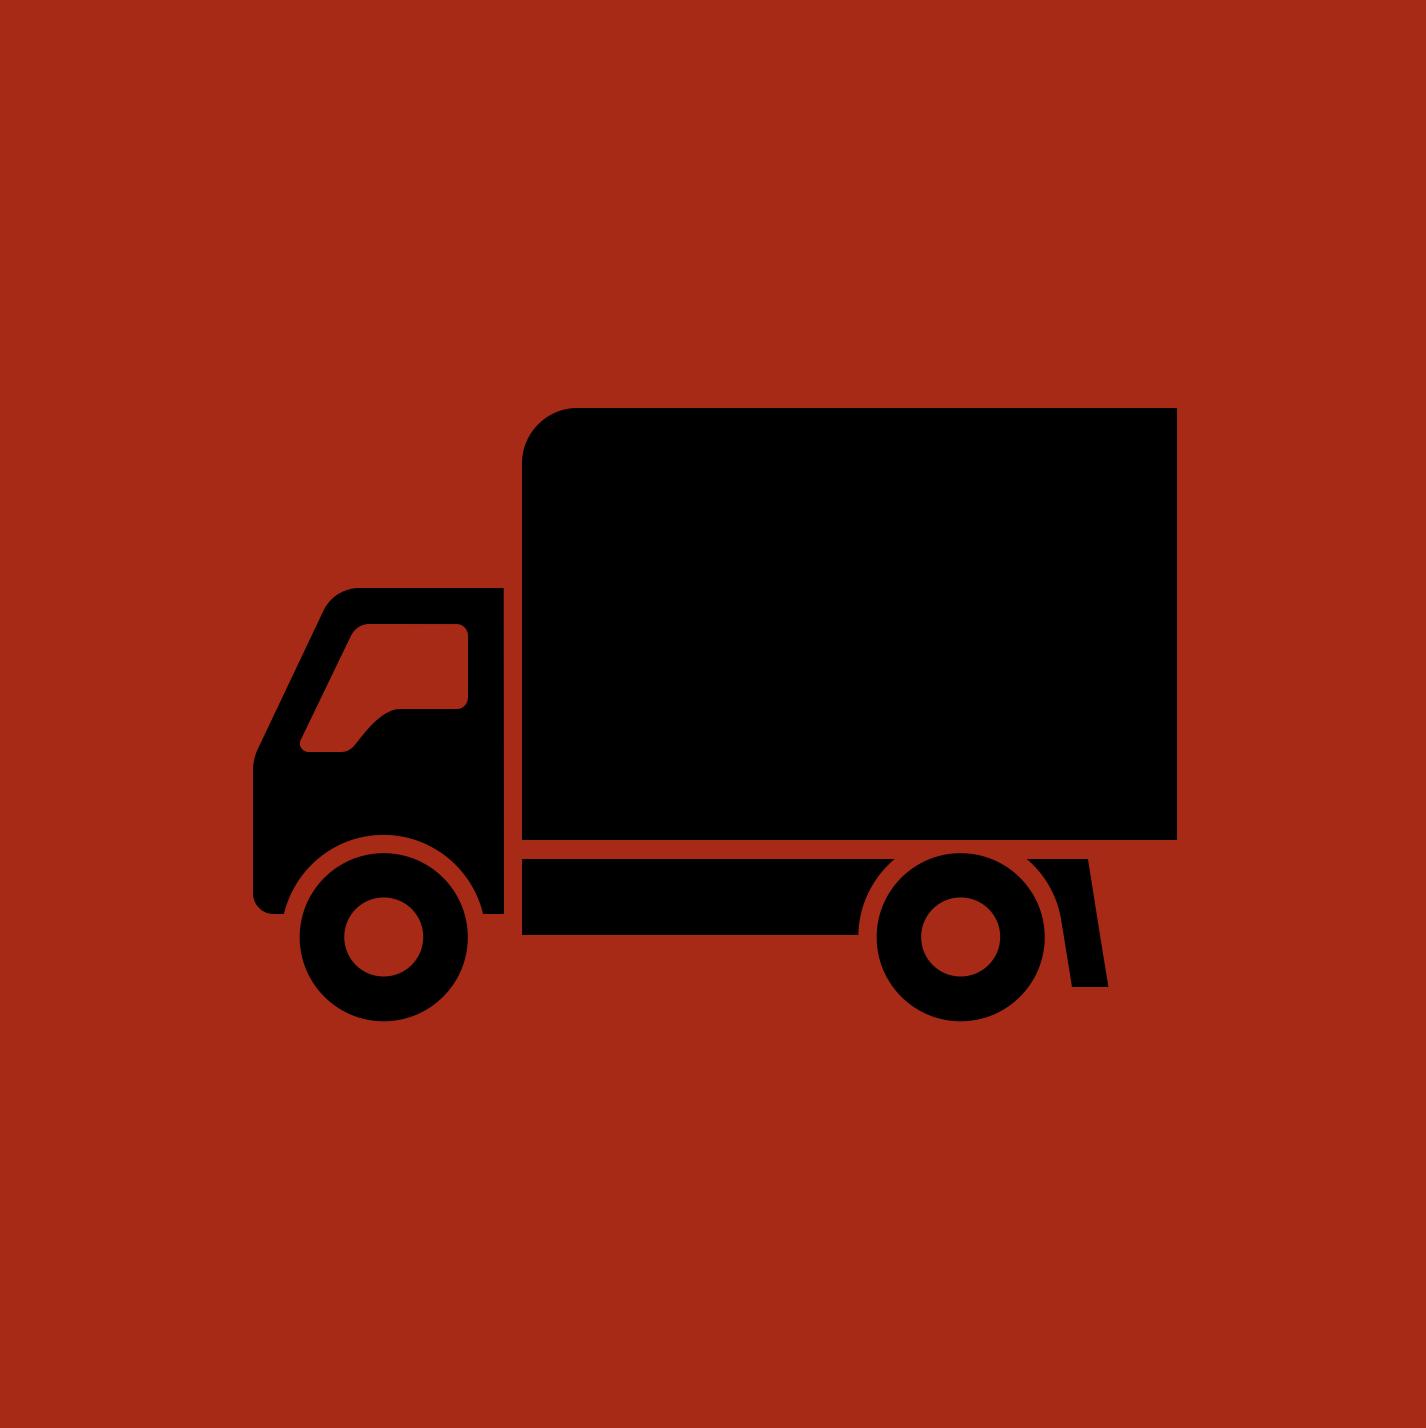 - Produktion: Logistik